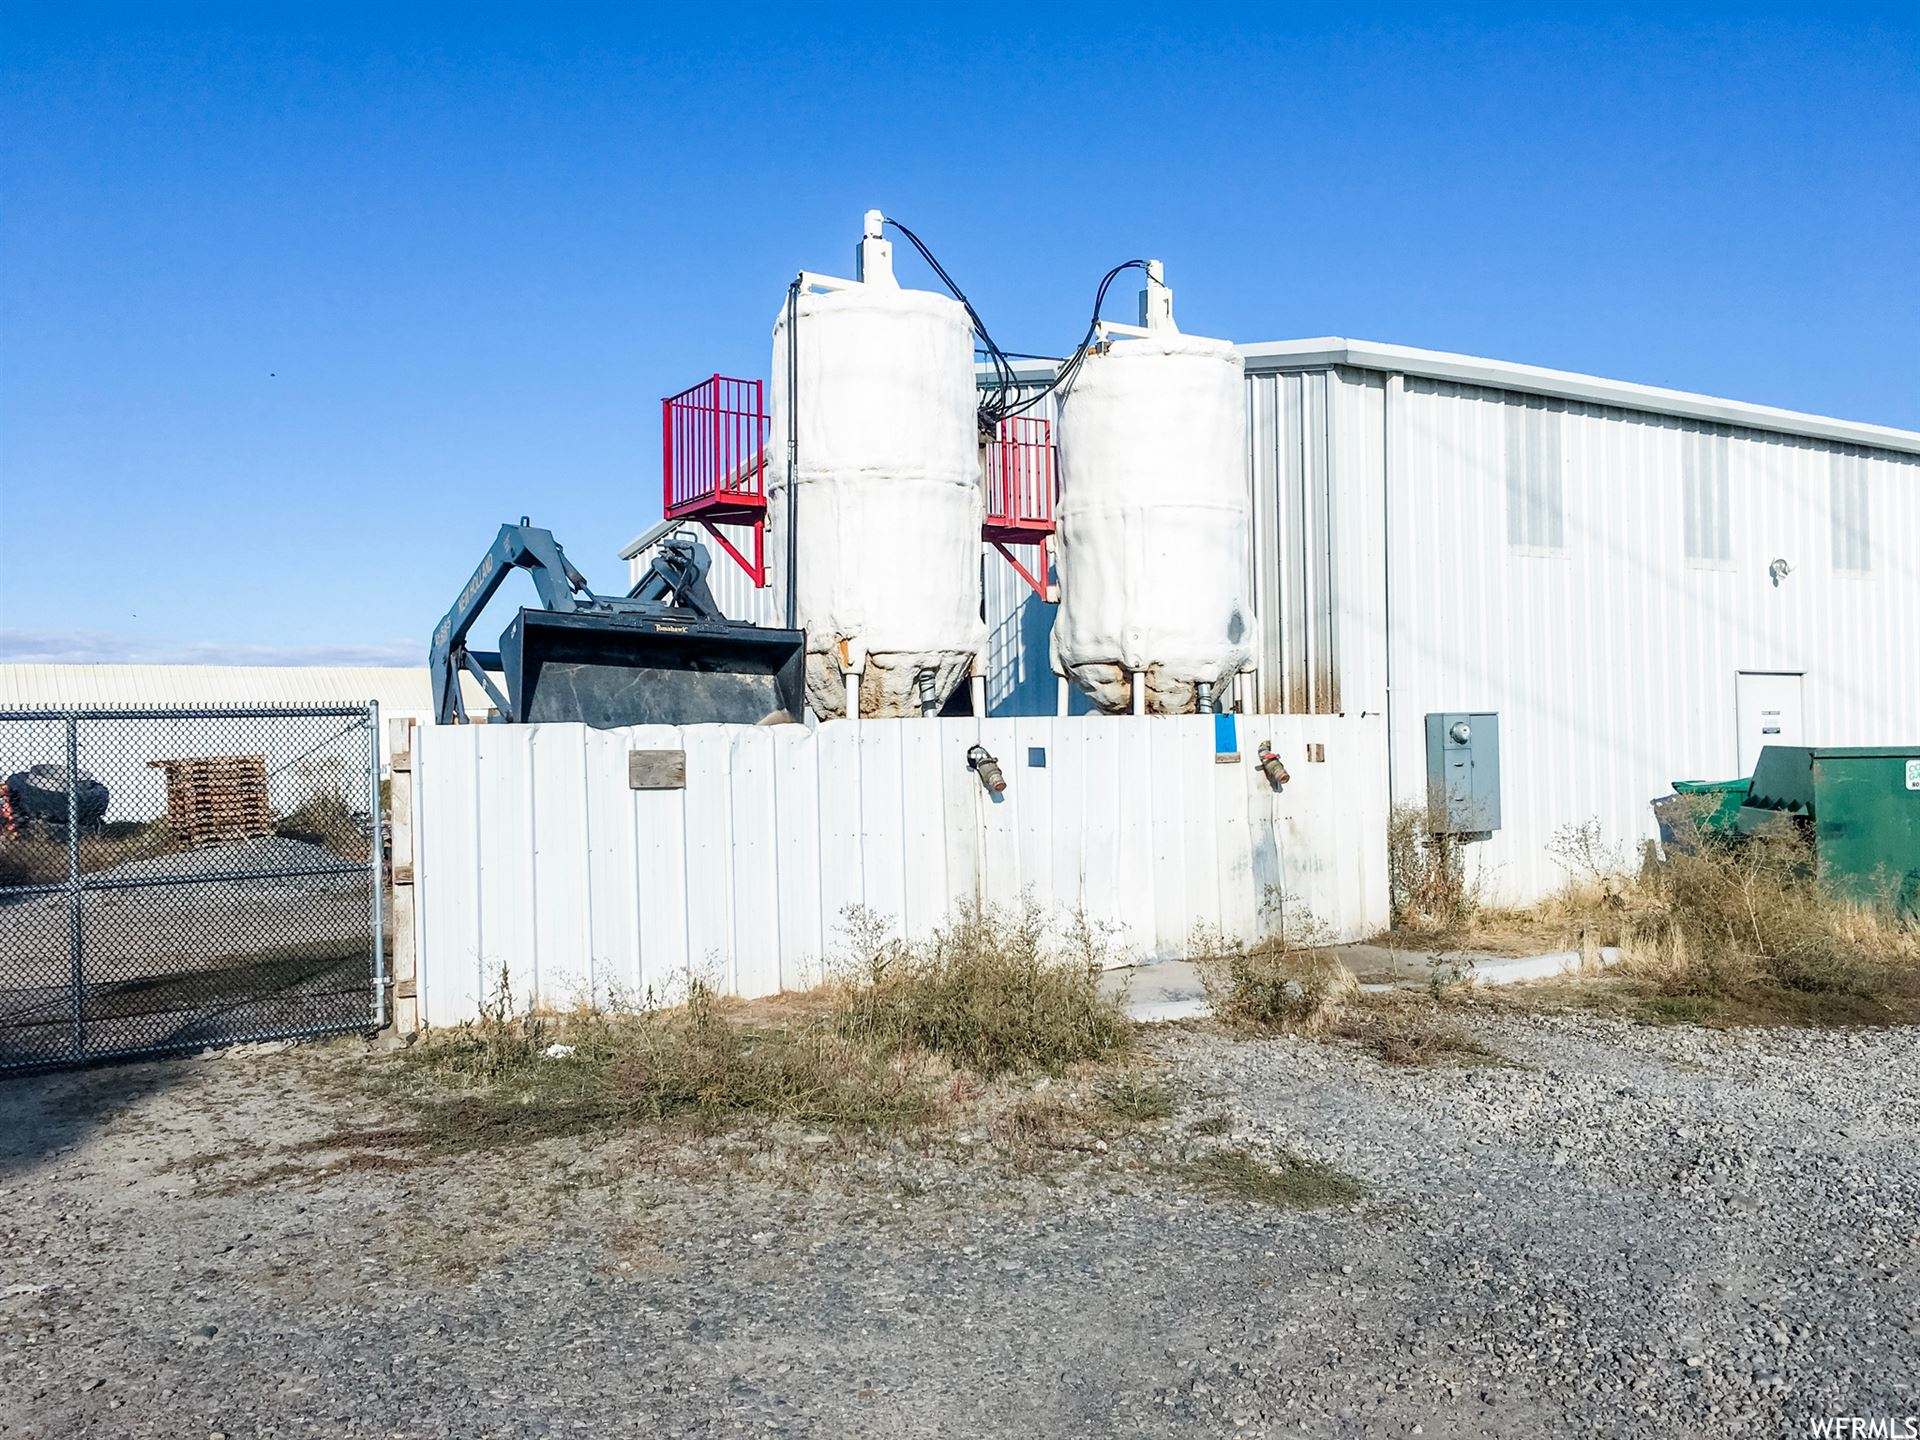 Photo of 5310 S 3200 W, Spanish Fork, UT 84660 (MLS # 1710054)